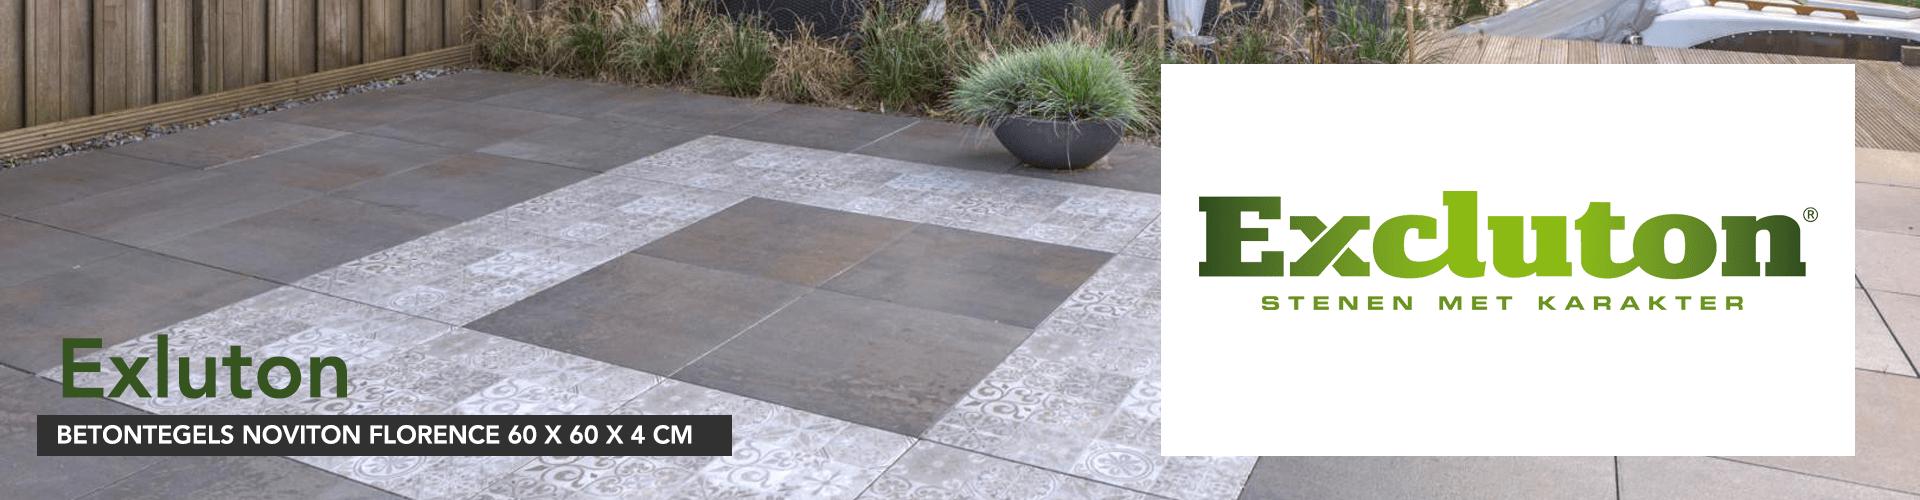 Slider-Exluton-betontegels-Noviton-Florence-1920x500px